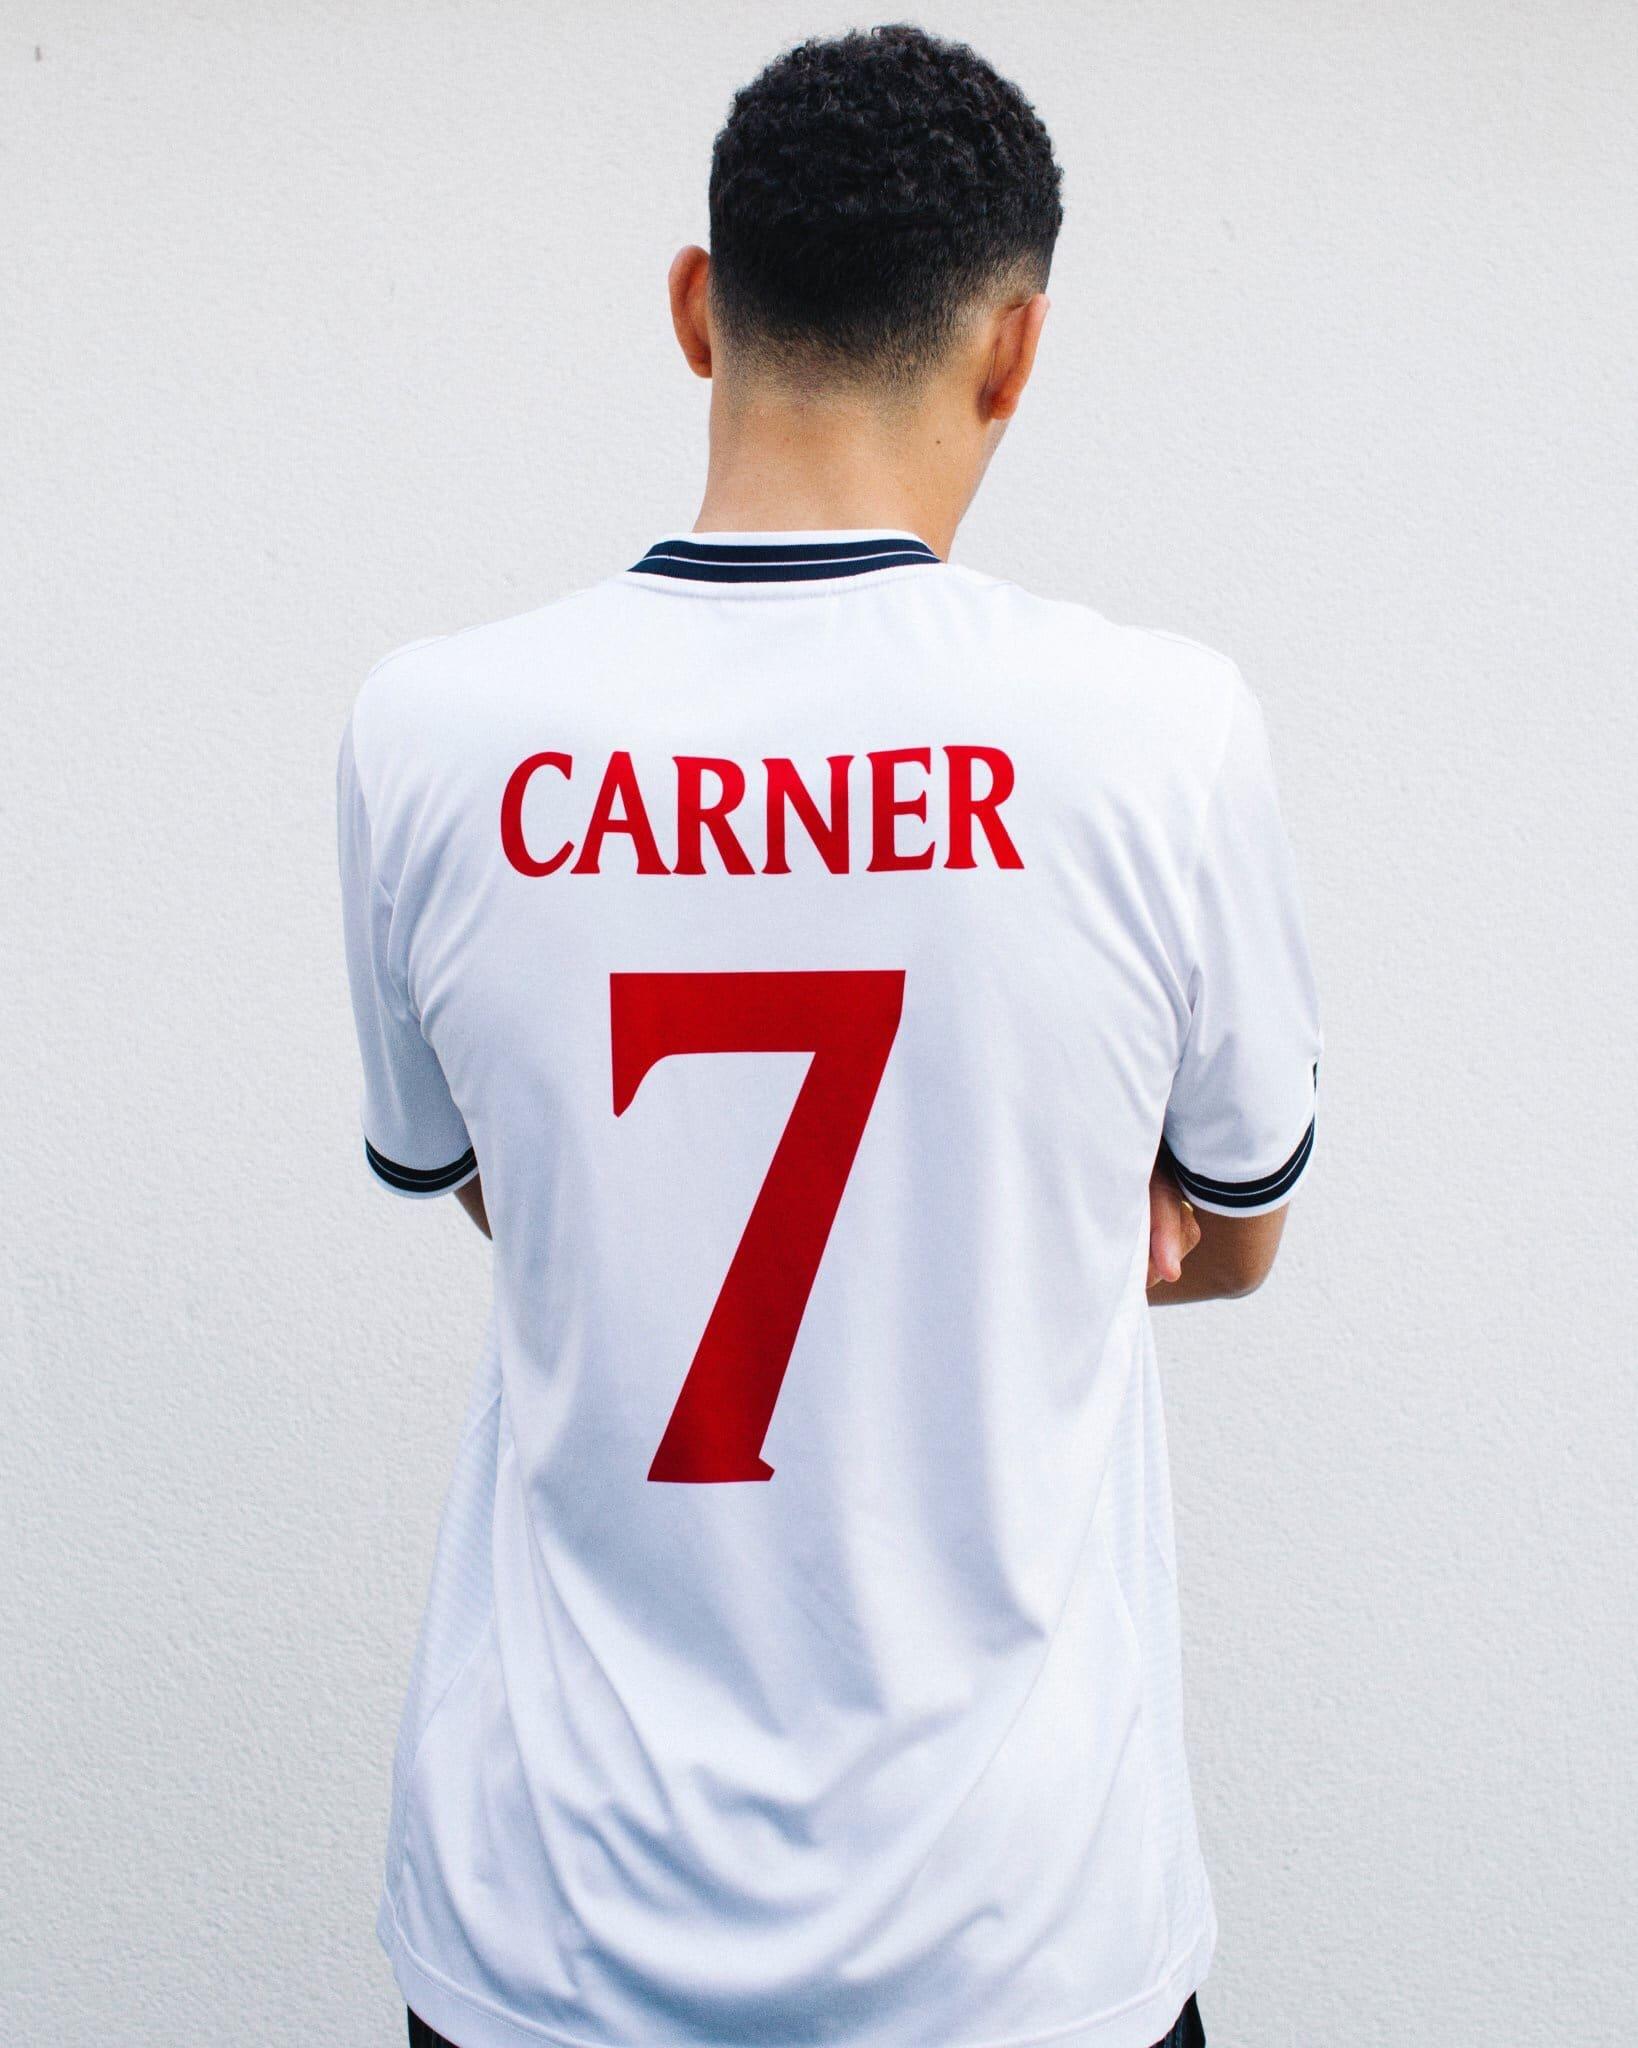 Loyle Carner X Umbro Football Shirt 2019